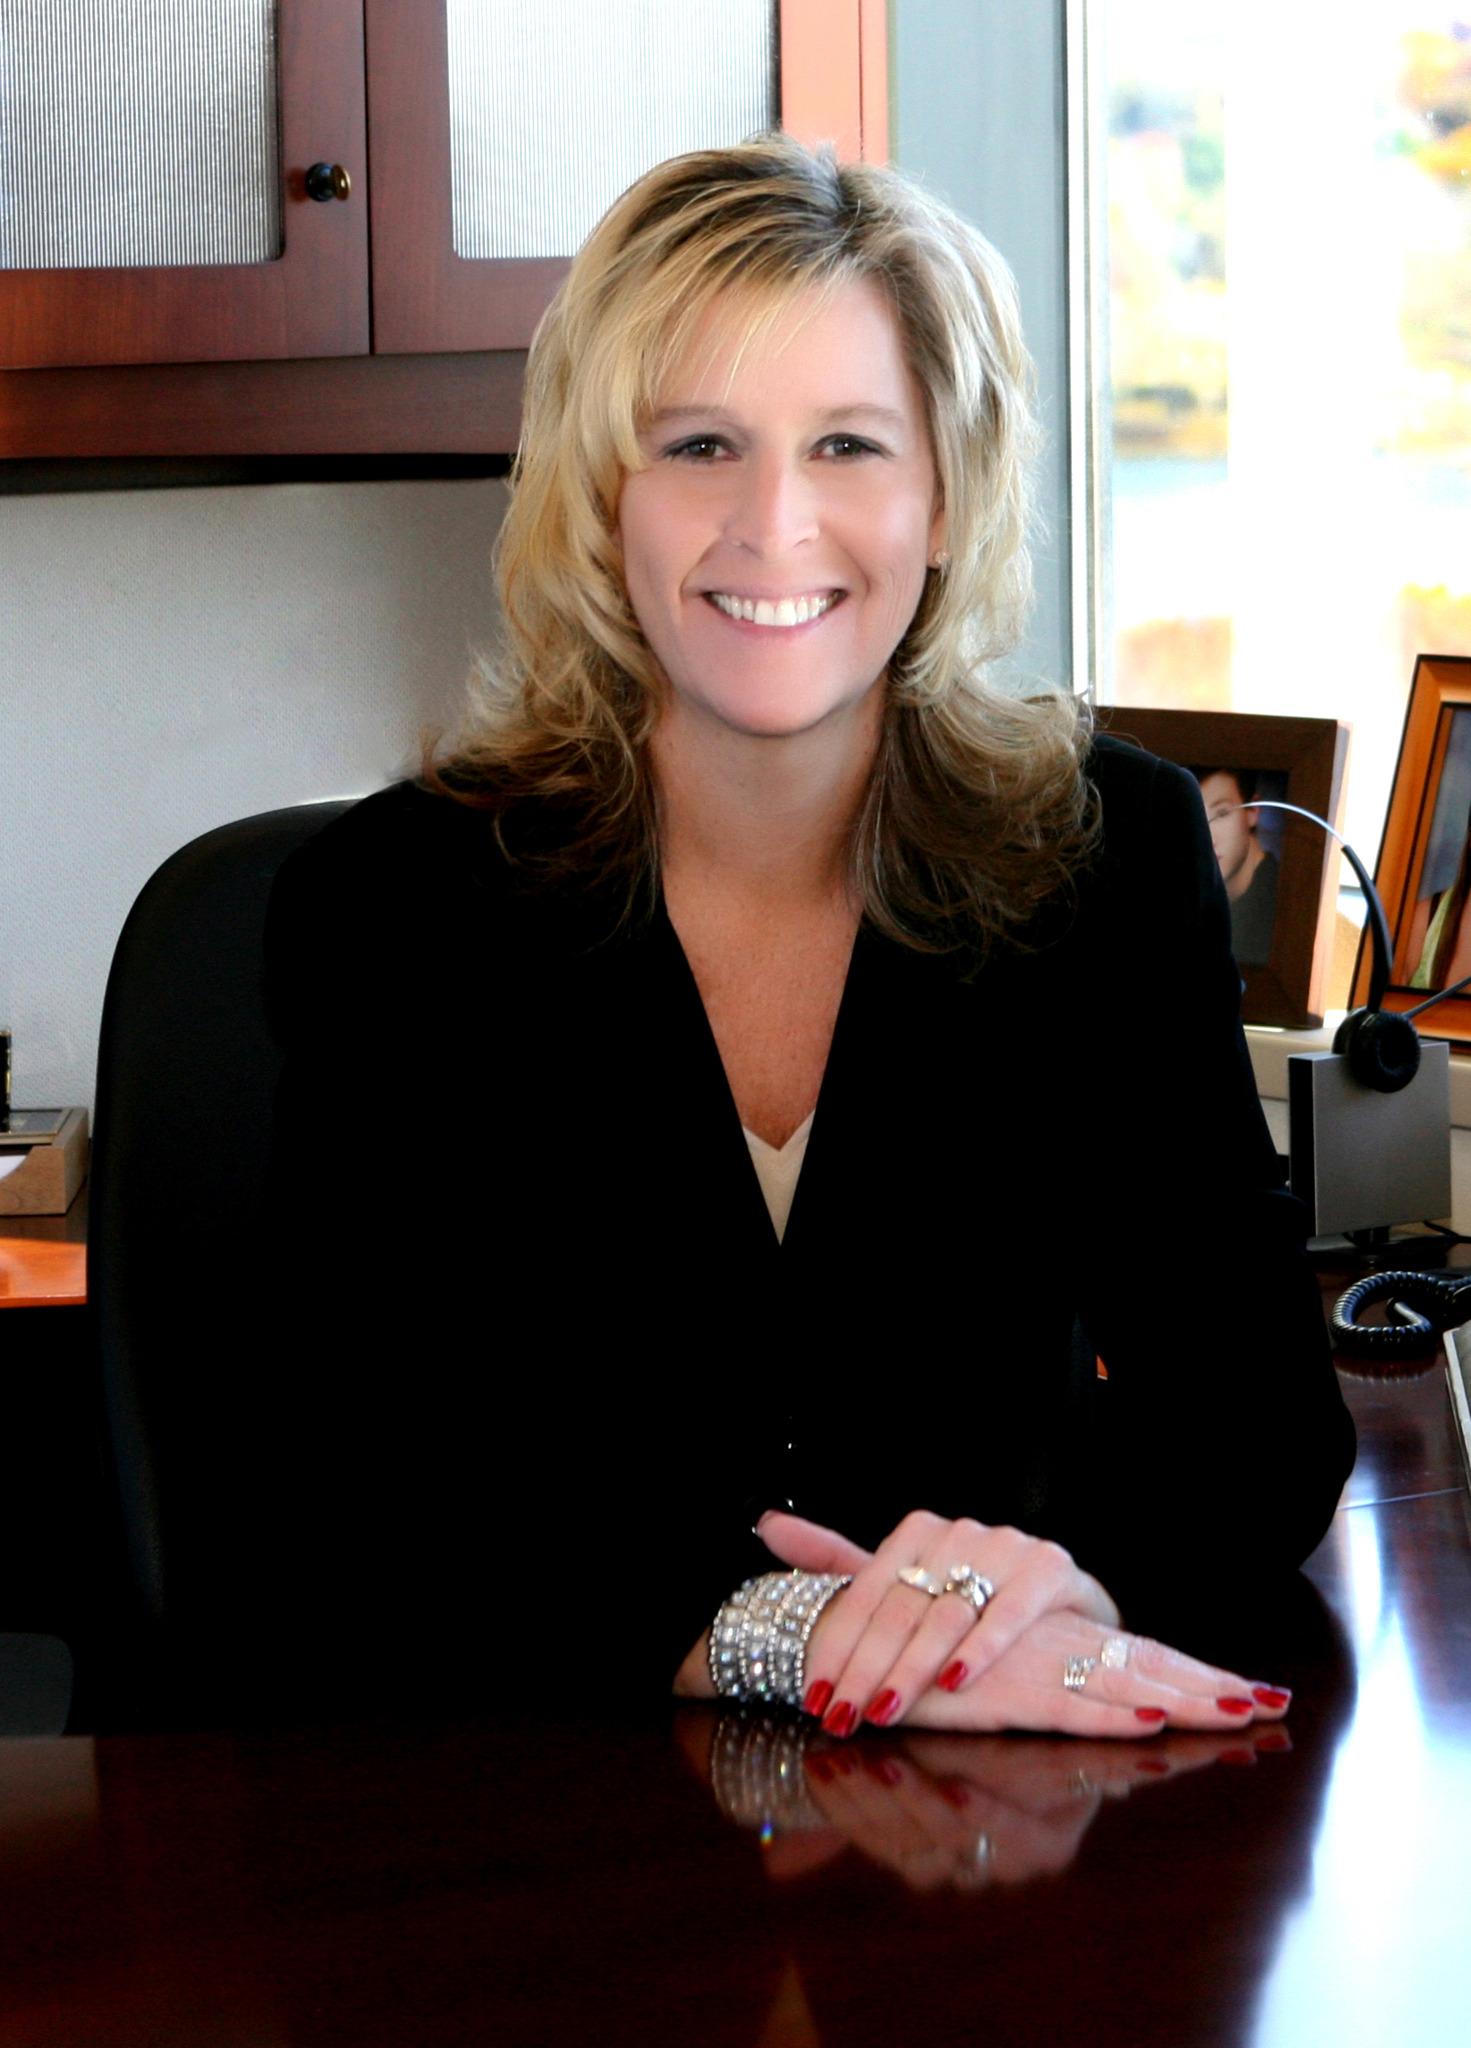 Kathryn Schwarz, Kathy Schwarz, President & CEO, Schwarz Insurance